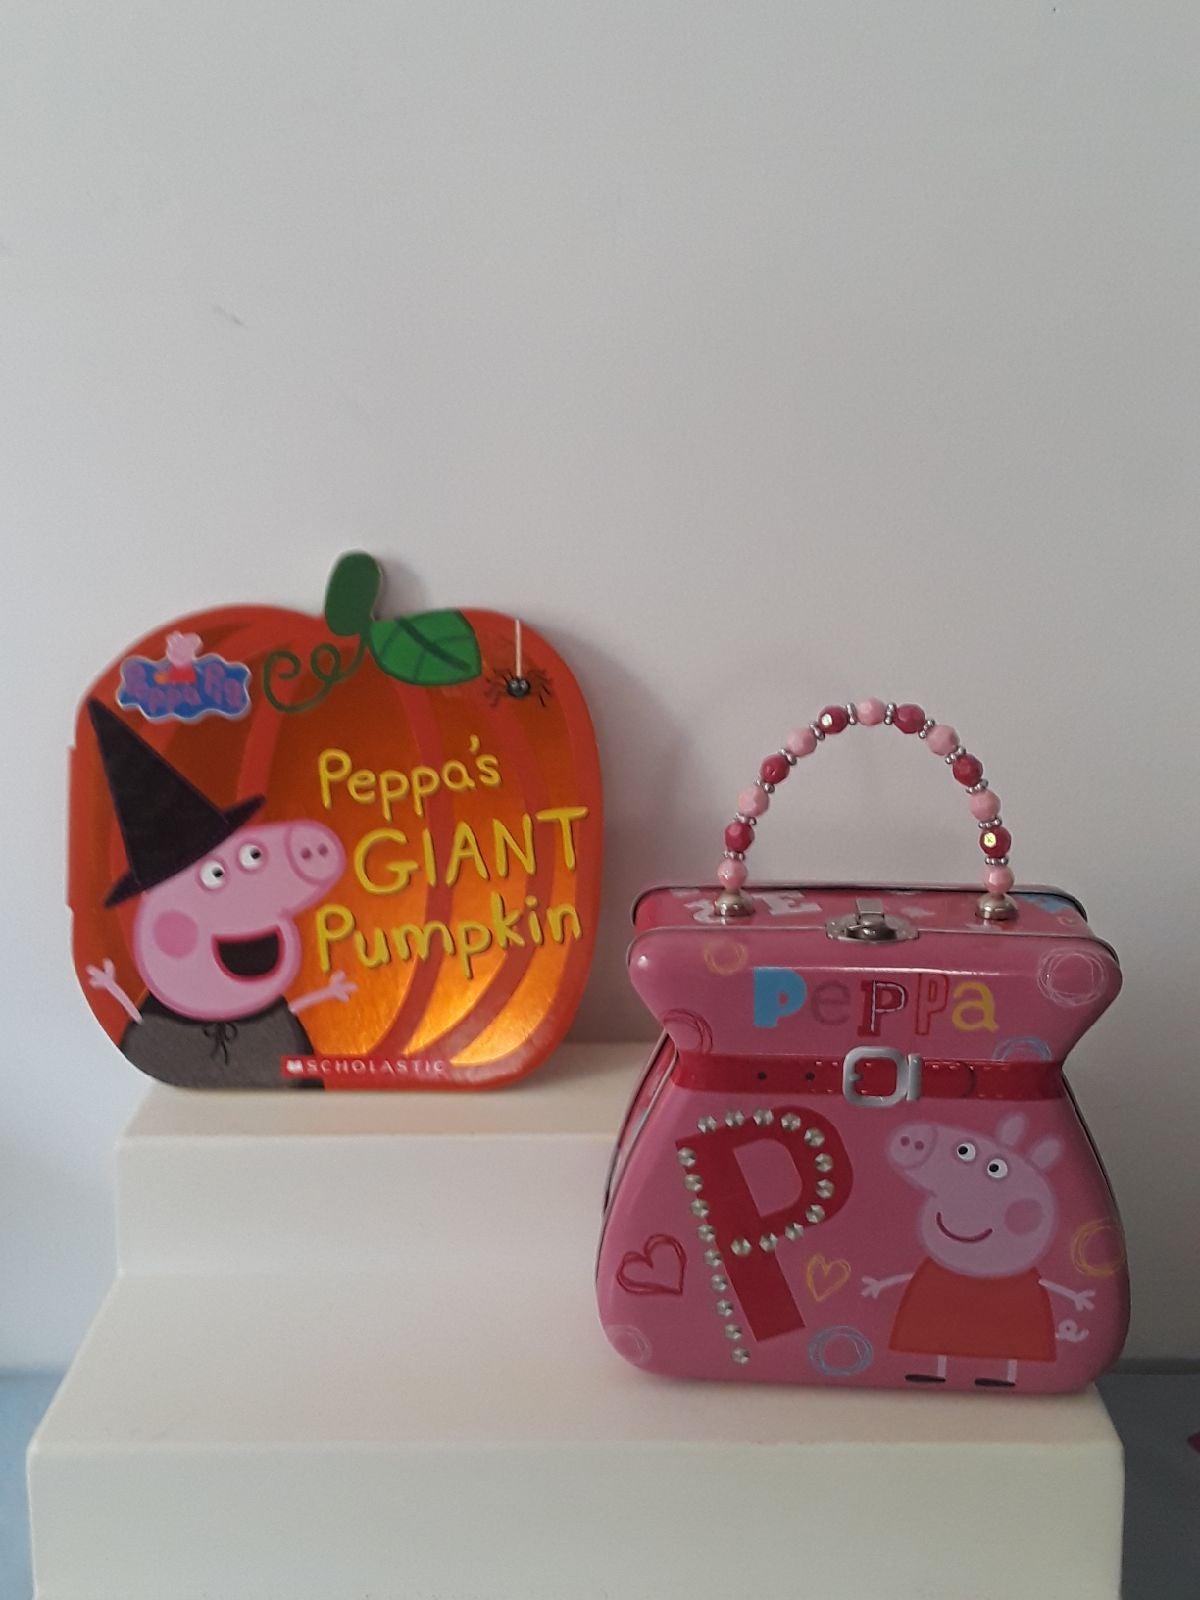 Peppa Pig giant pumpkin Book & Metal pur